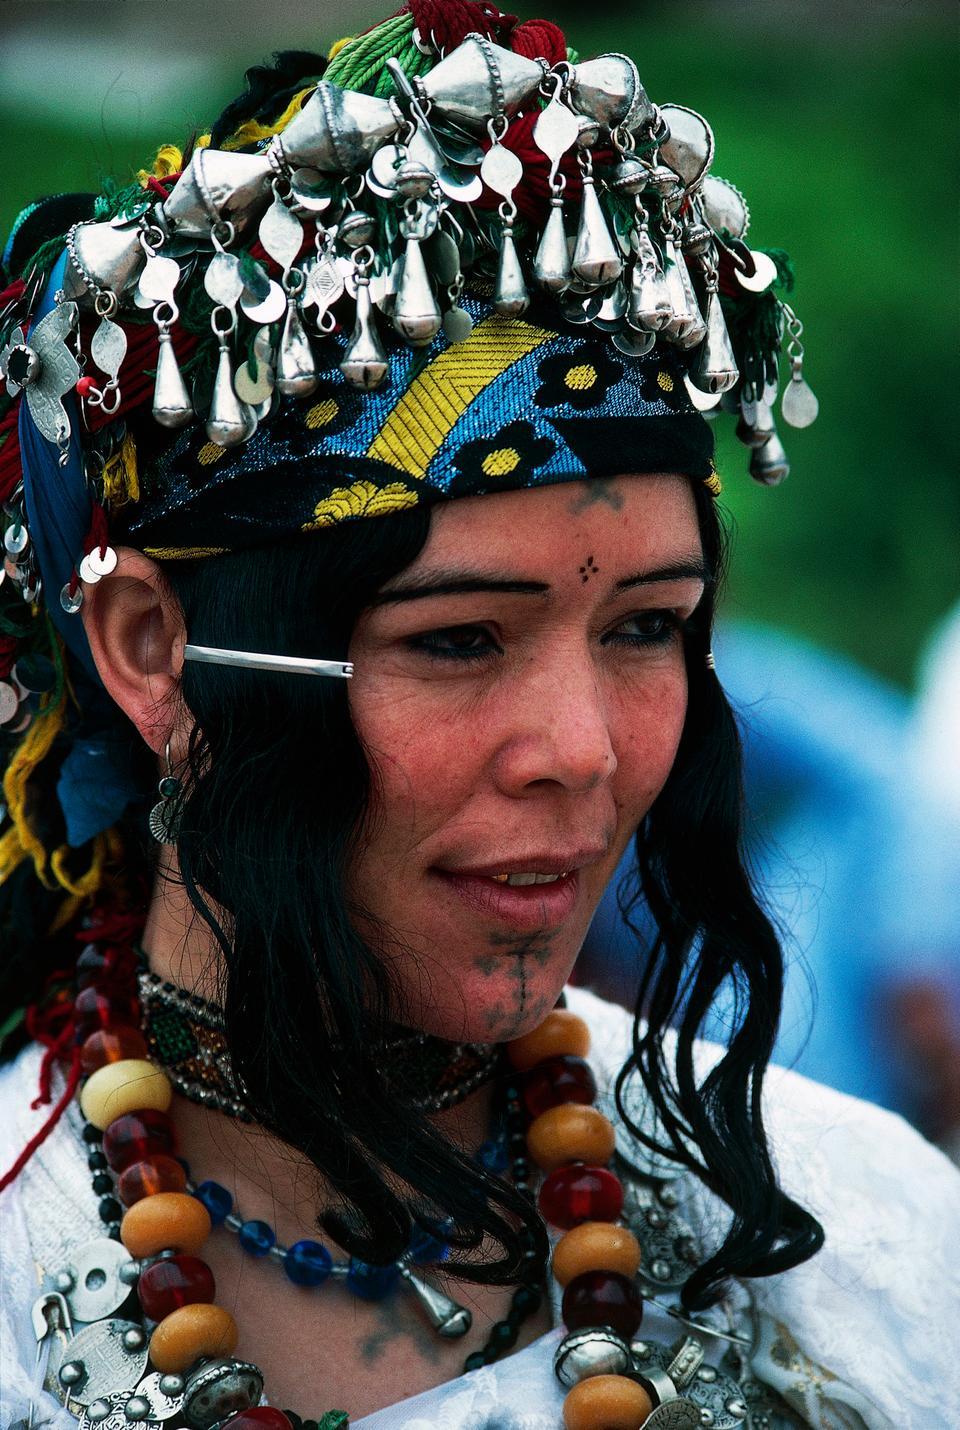 Berber woman wearing traditional costume and ethnic jewelery, Ait Bougmez, Morocco.